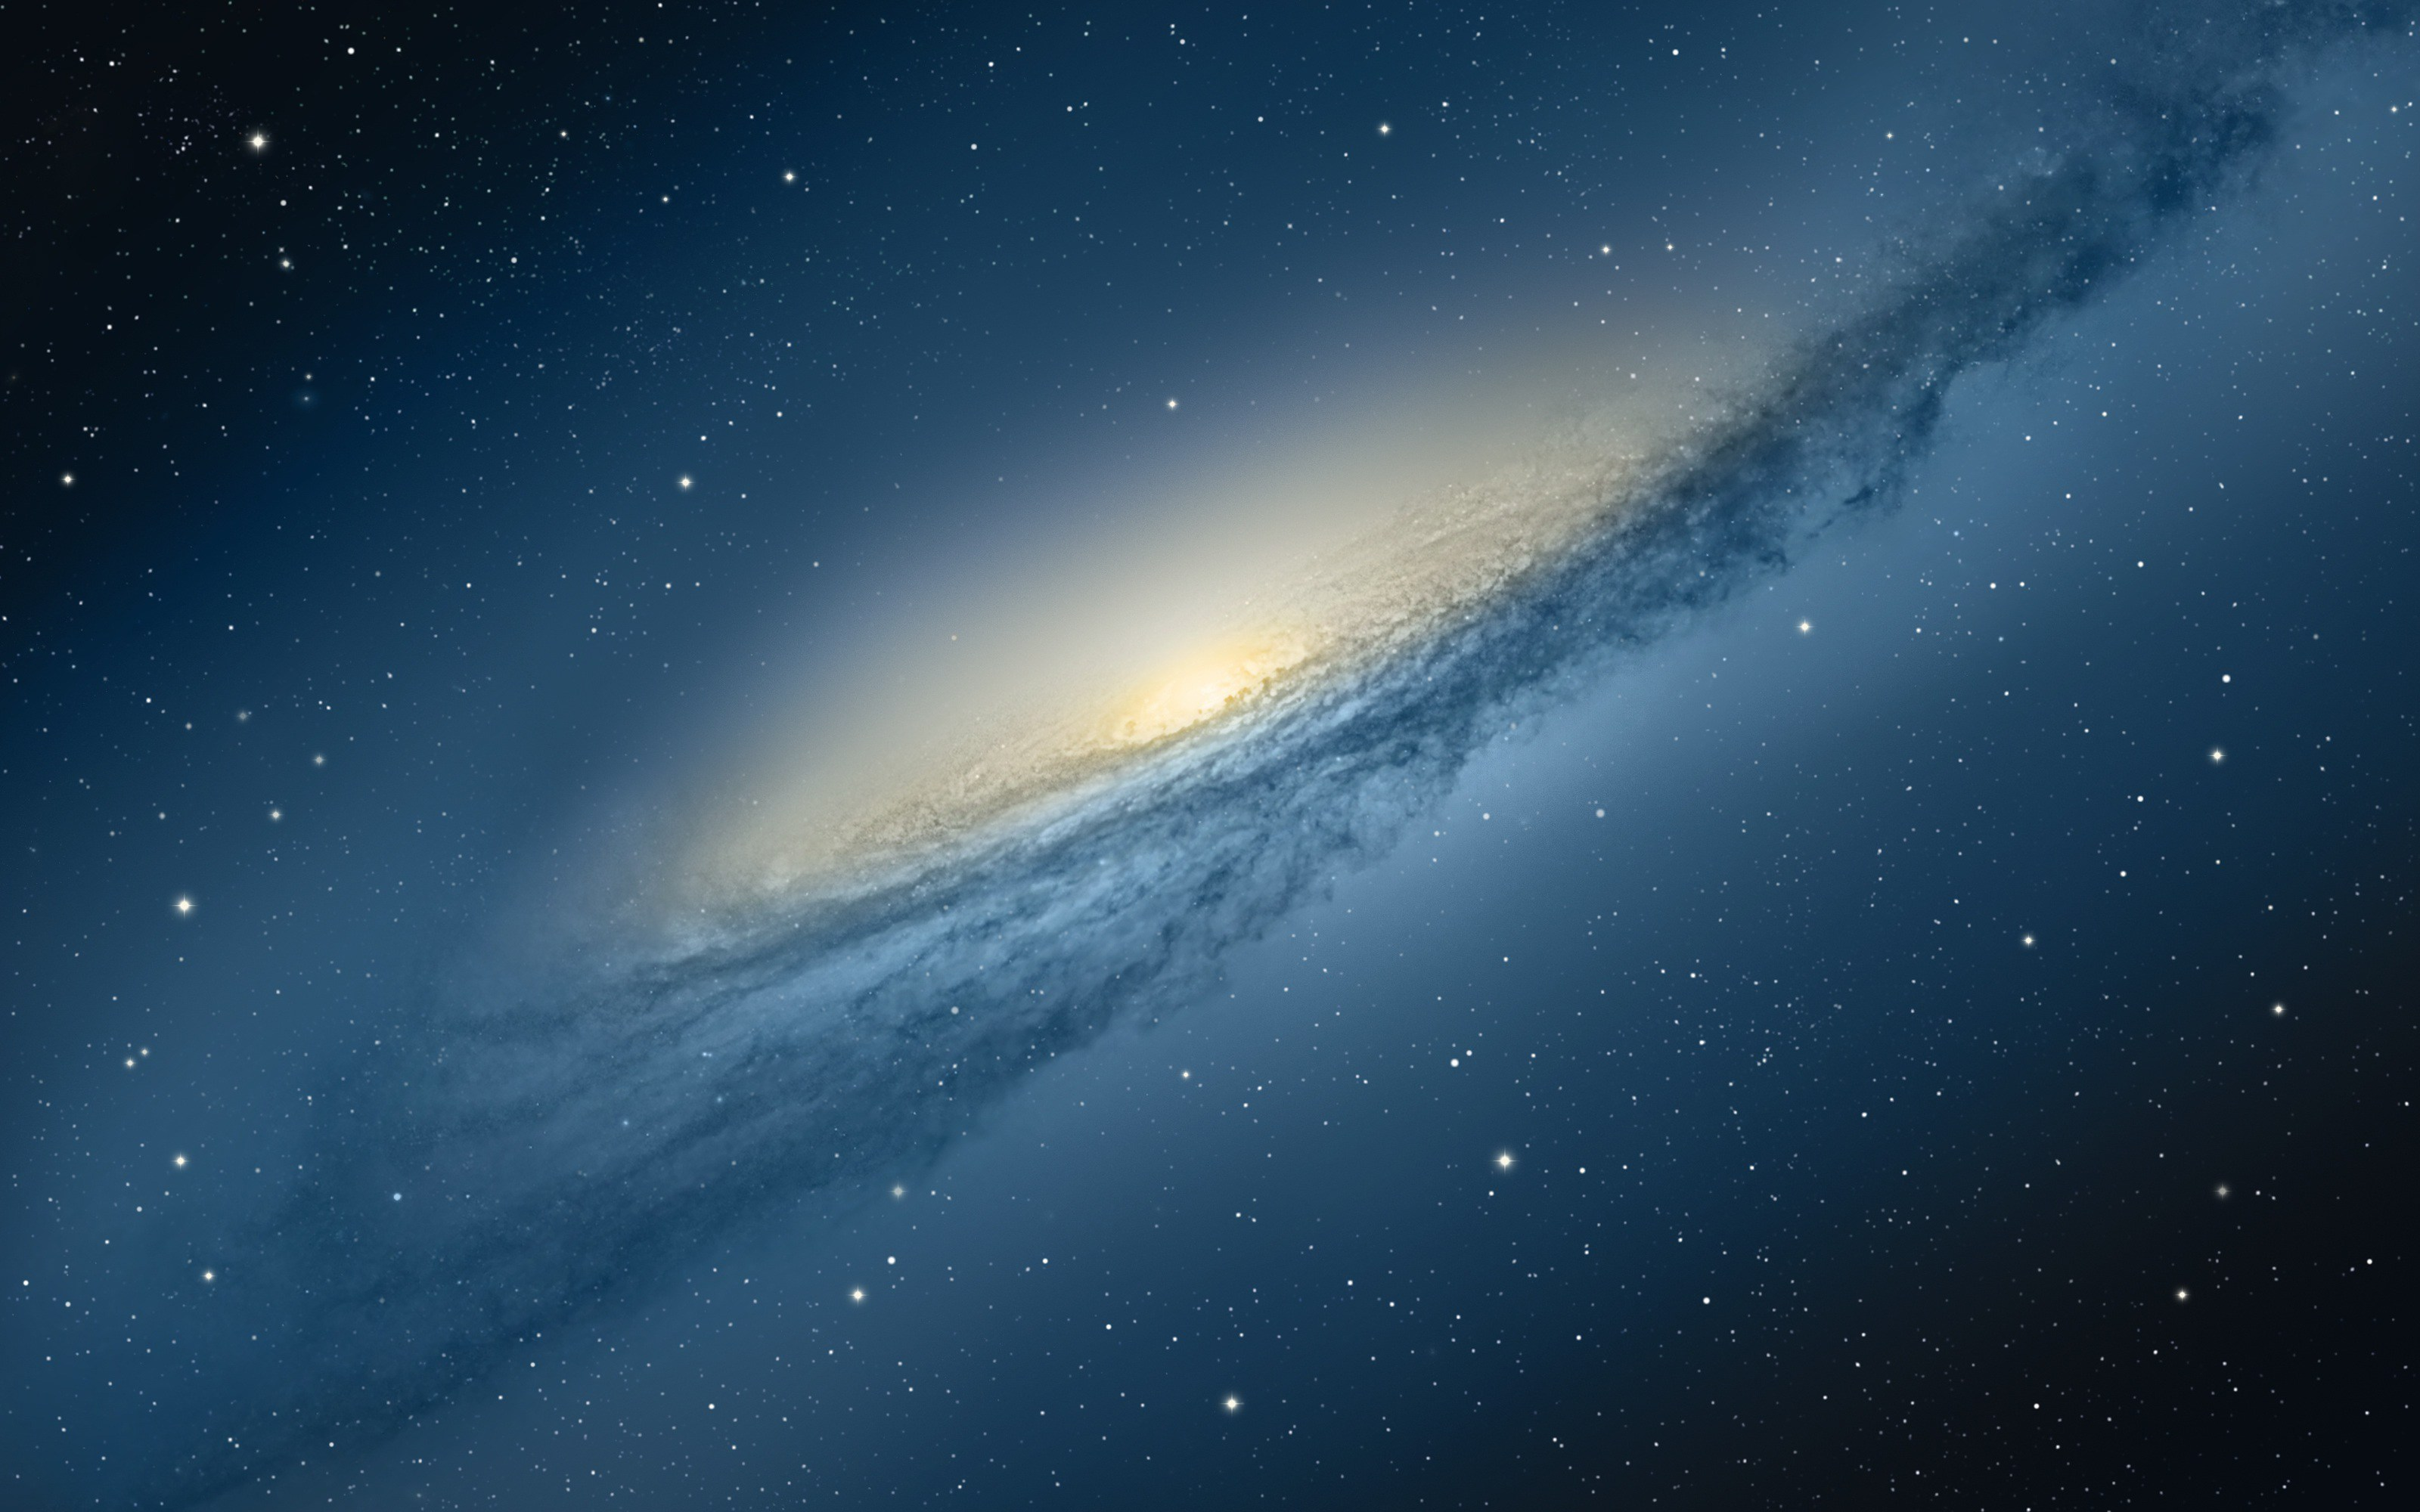 Retina Display Galaxy Wallpaper for Macbook Pro 3200x2000